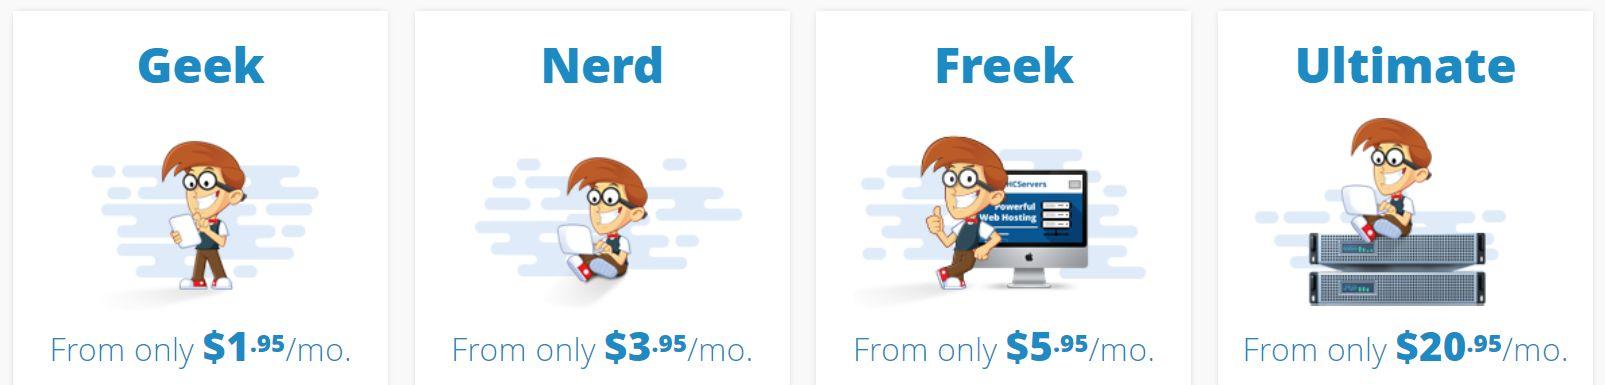 thc servers-web hosting-prices